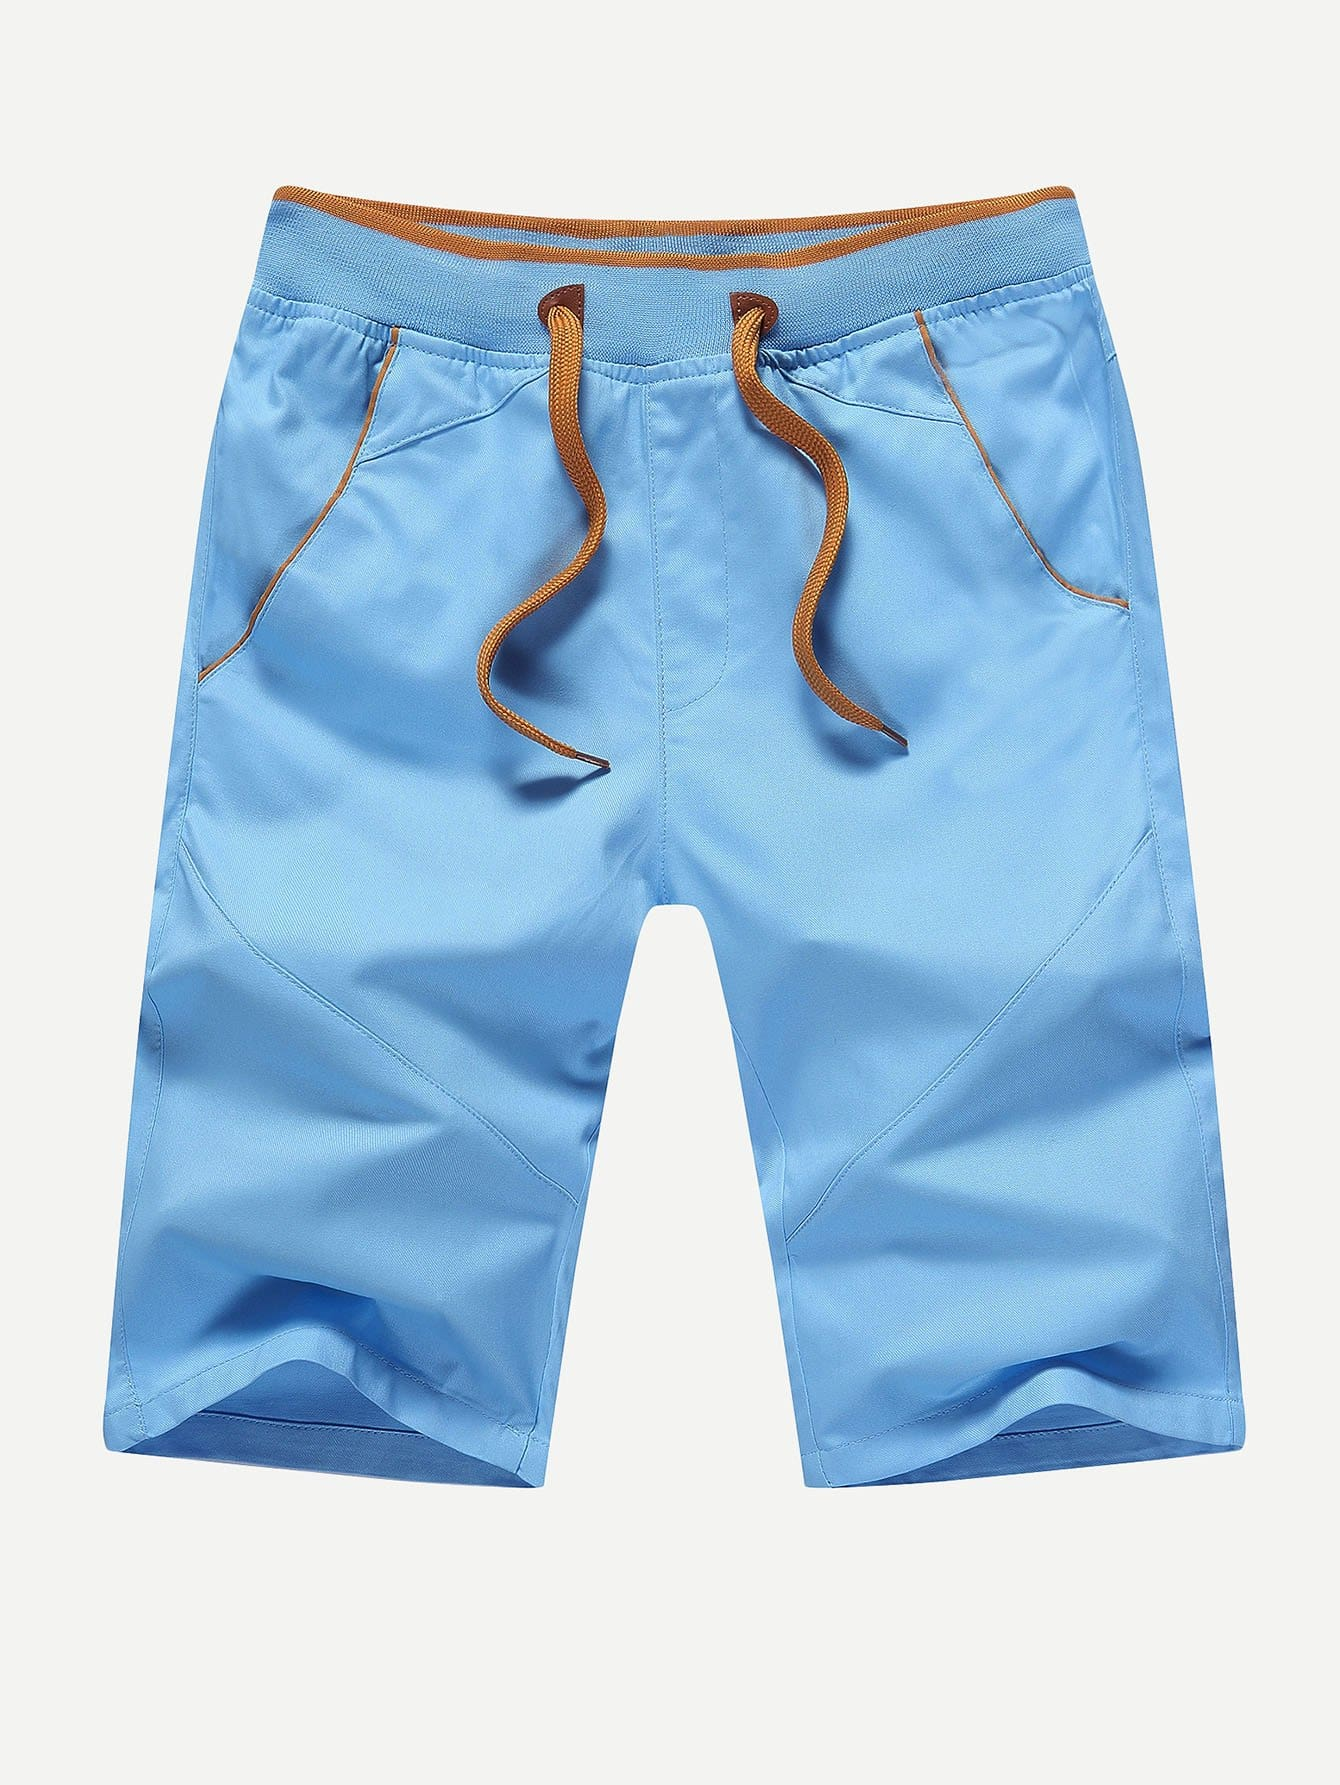 Men Drawstring Cut And Sew Panel Shorts men cut and sew panel beach shorts